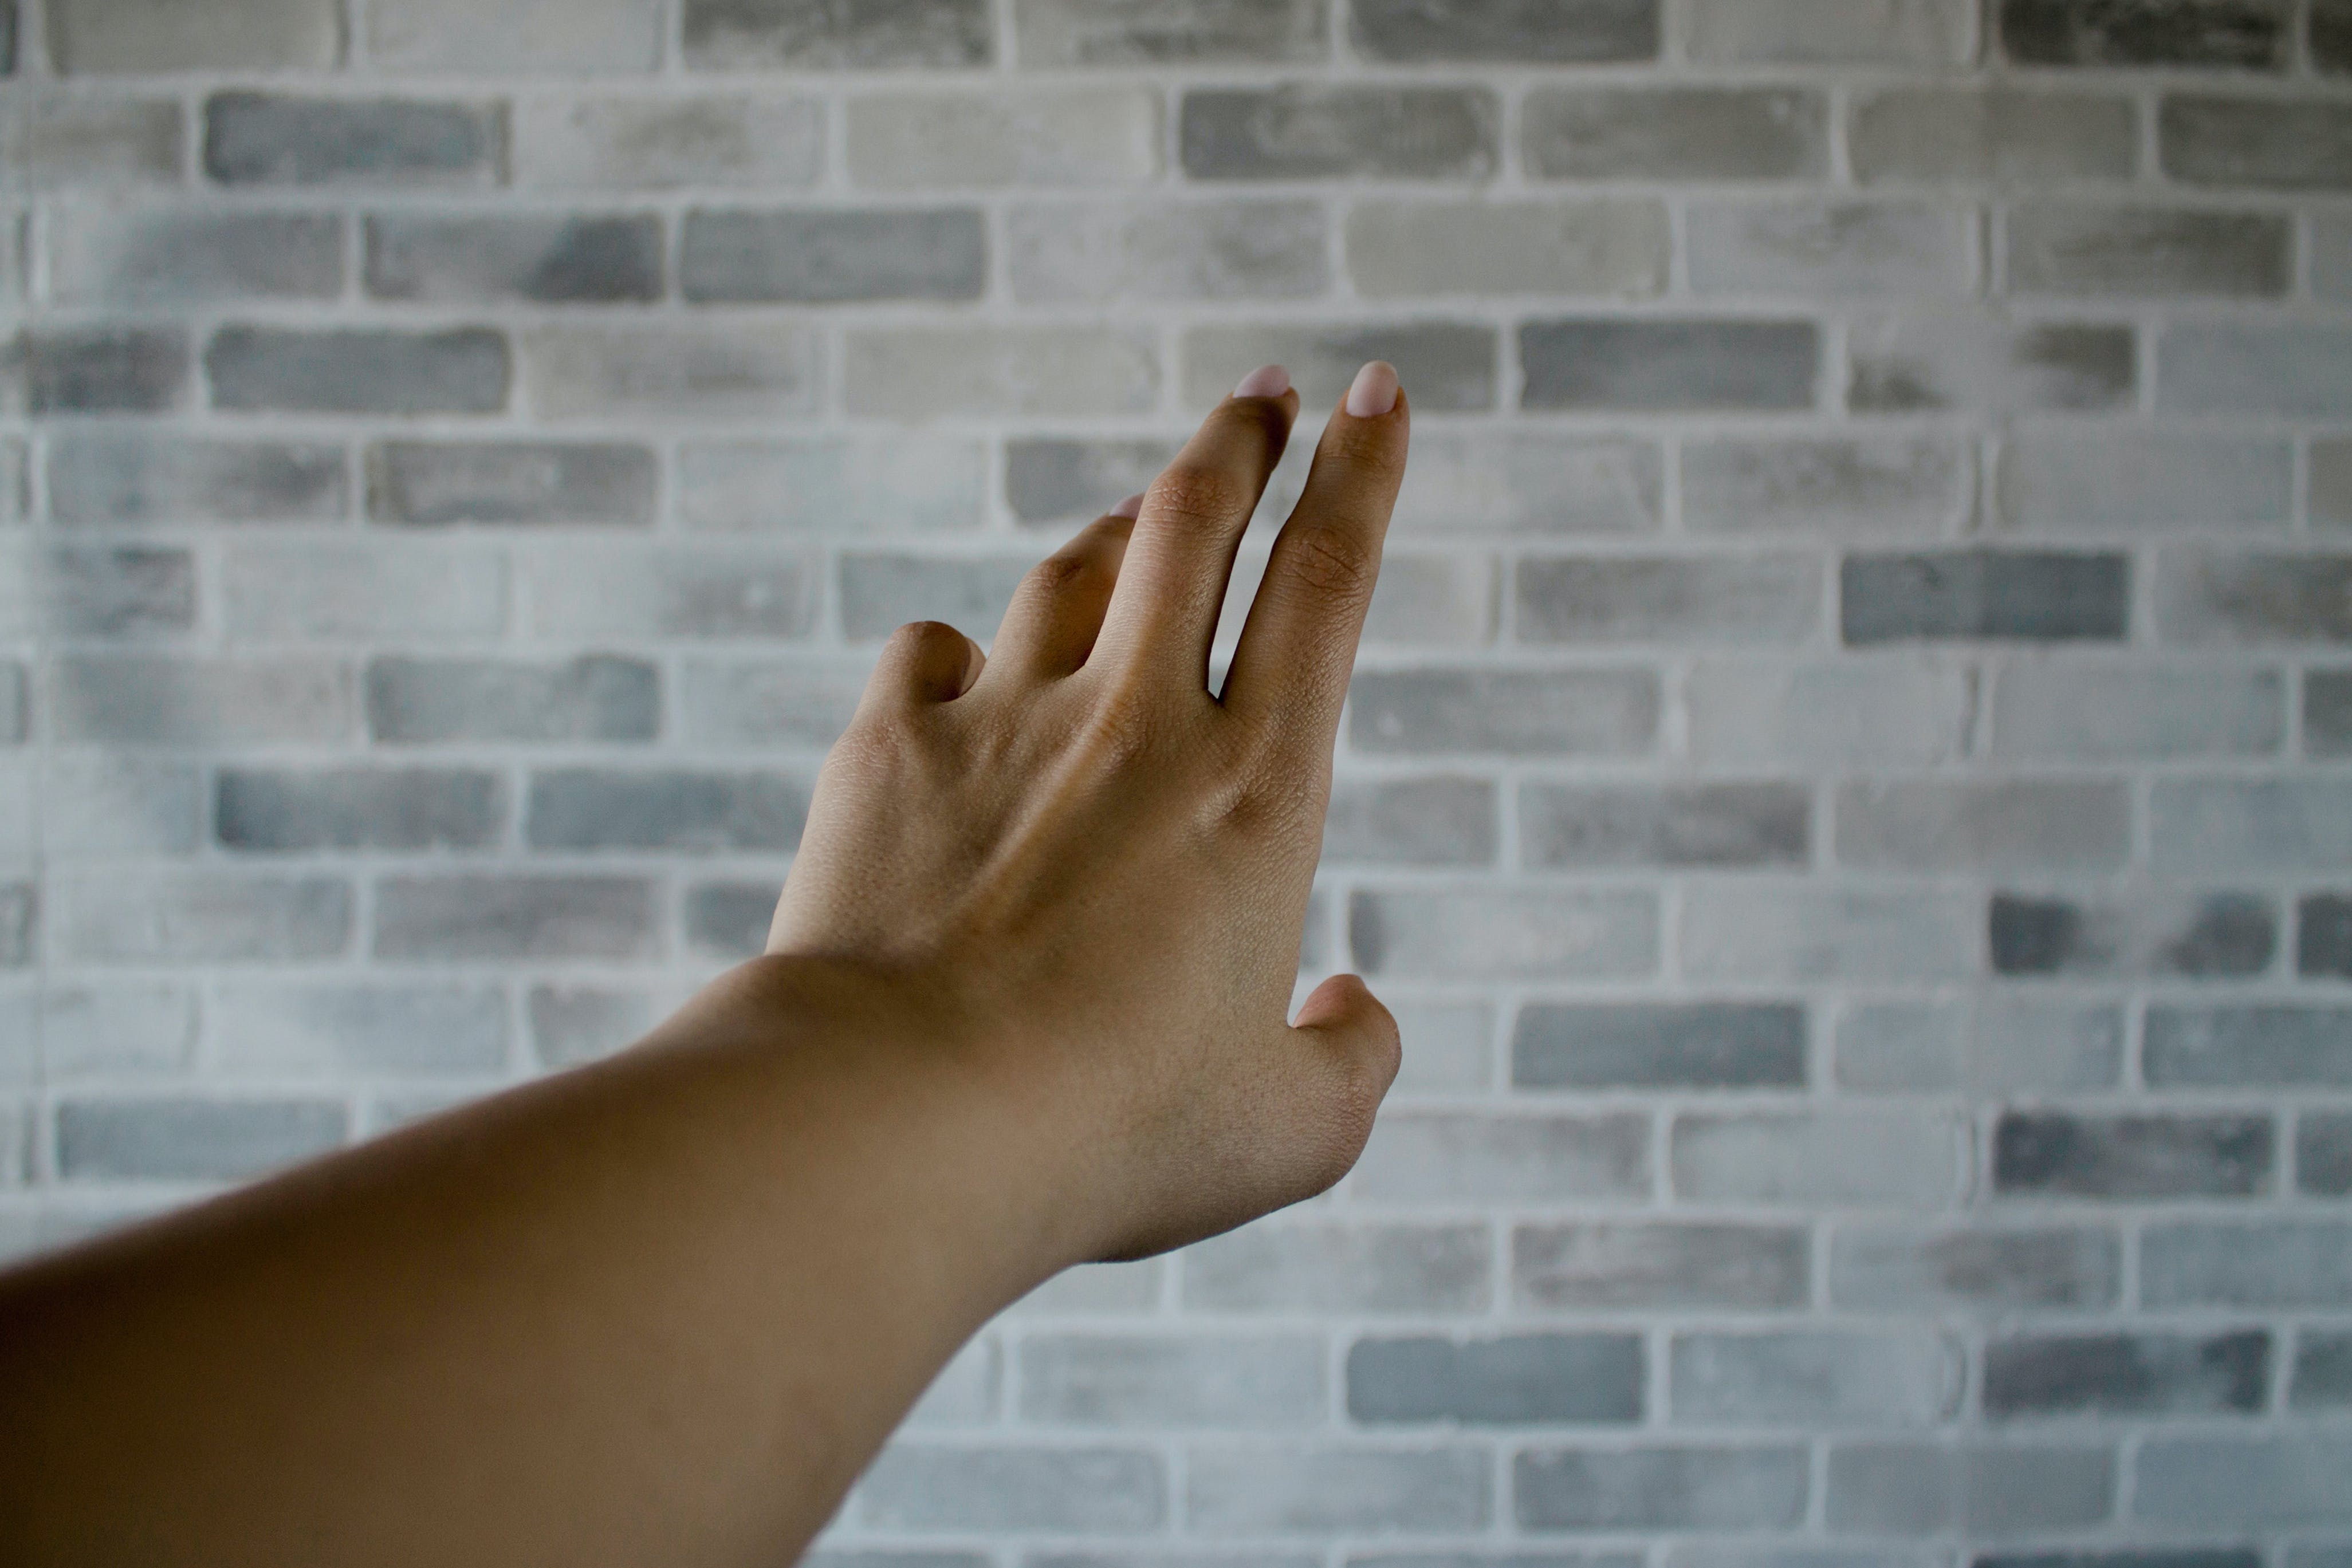 Person's Left Hand Near Gray Cinder Bricks